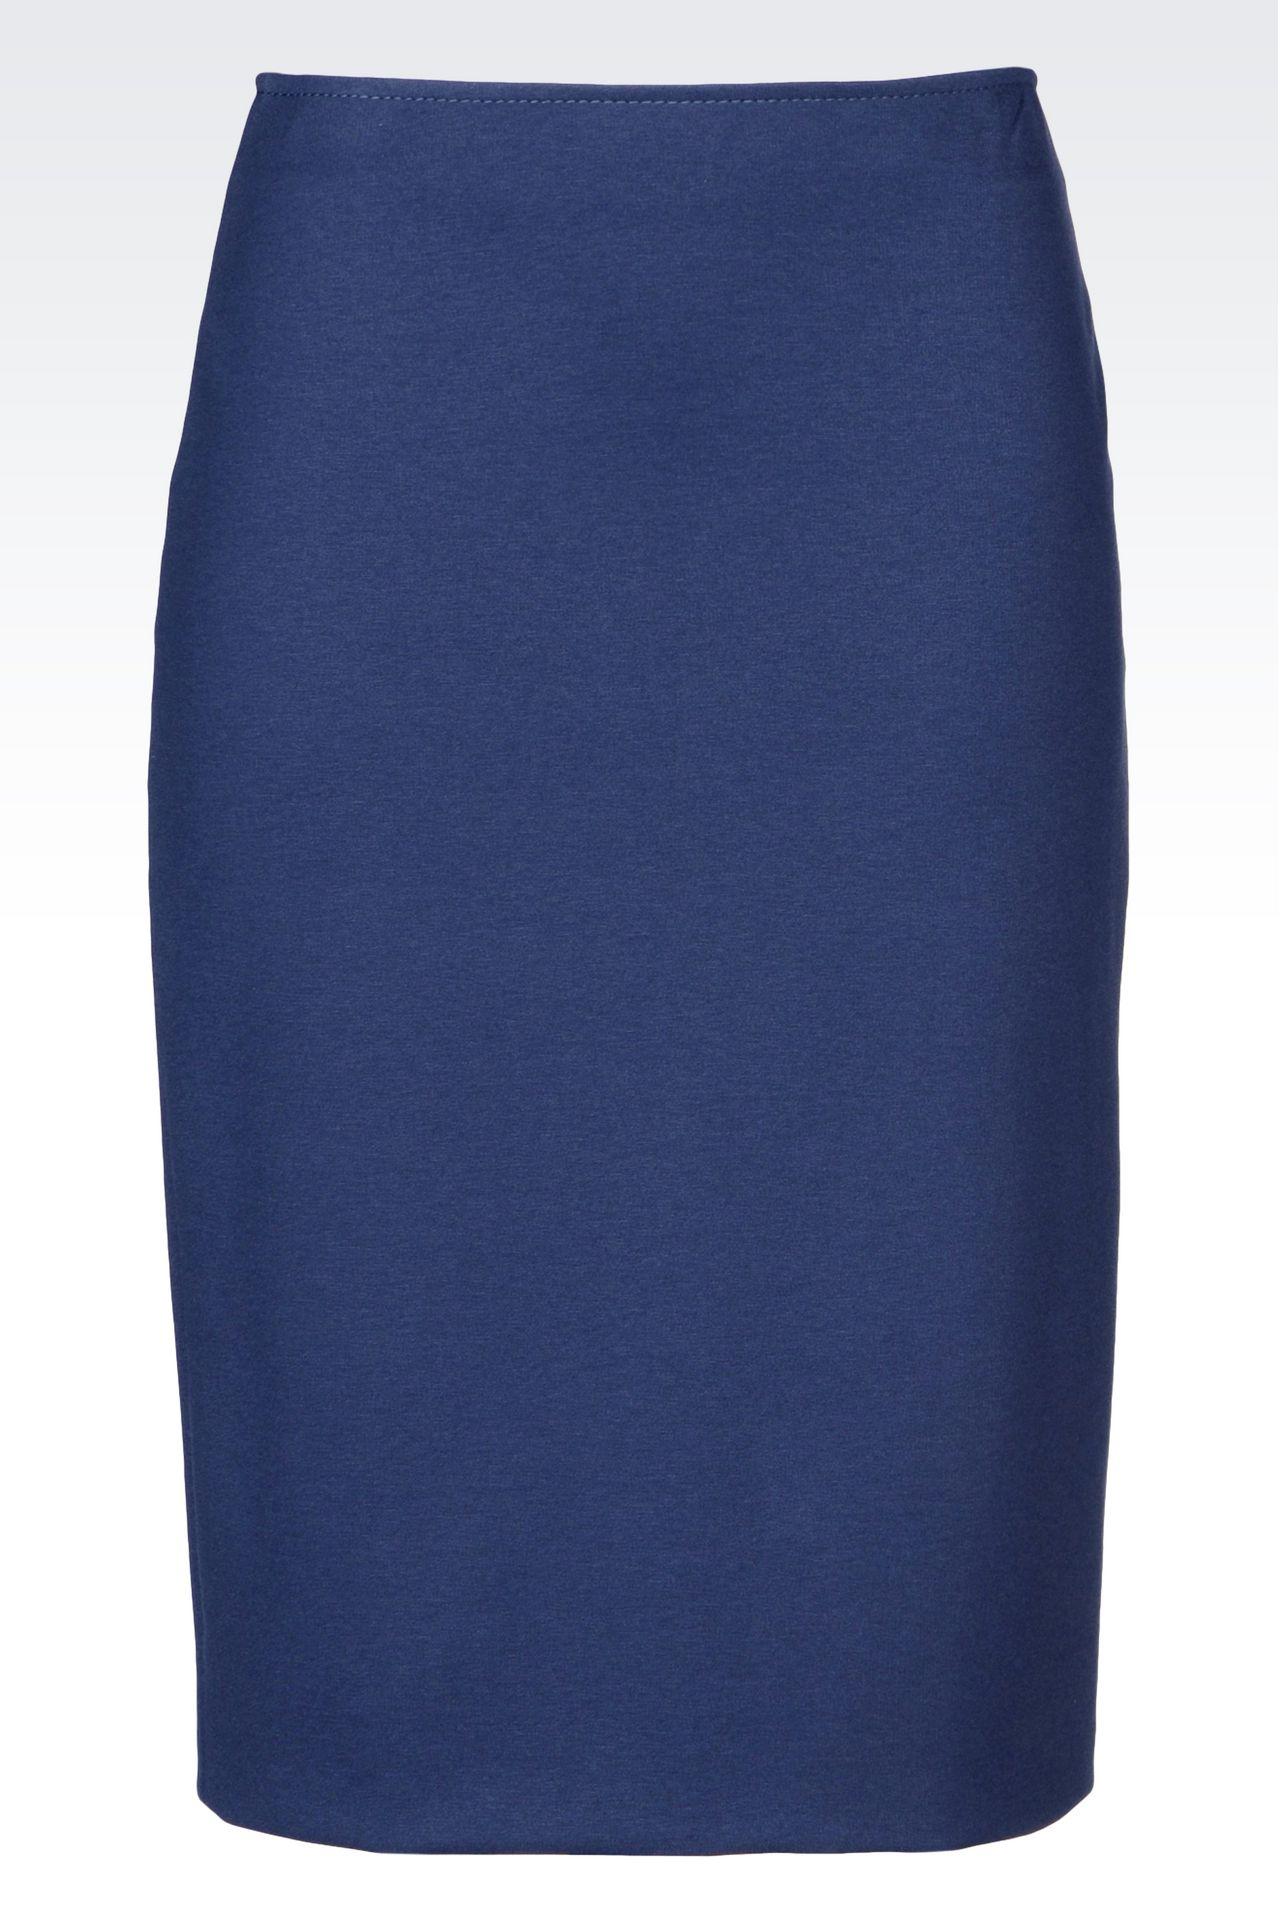 PENCIL SKIRT IN MILANO RIB: Knee length skirts Women by Armani - 0